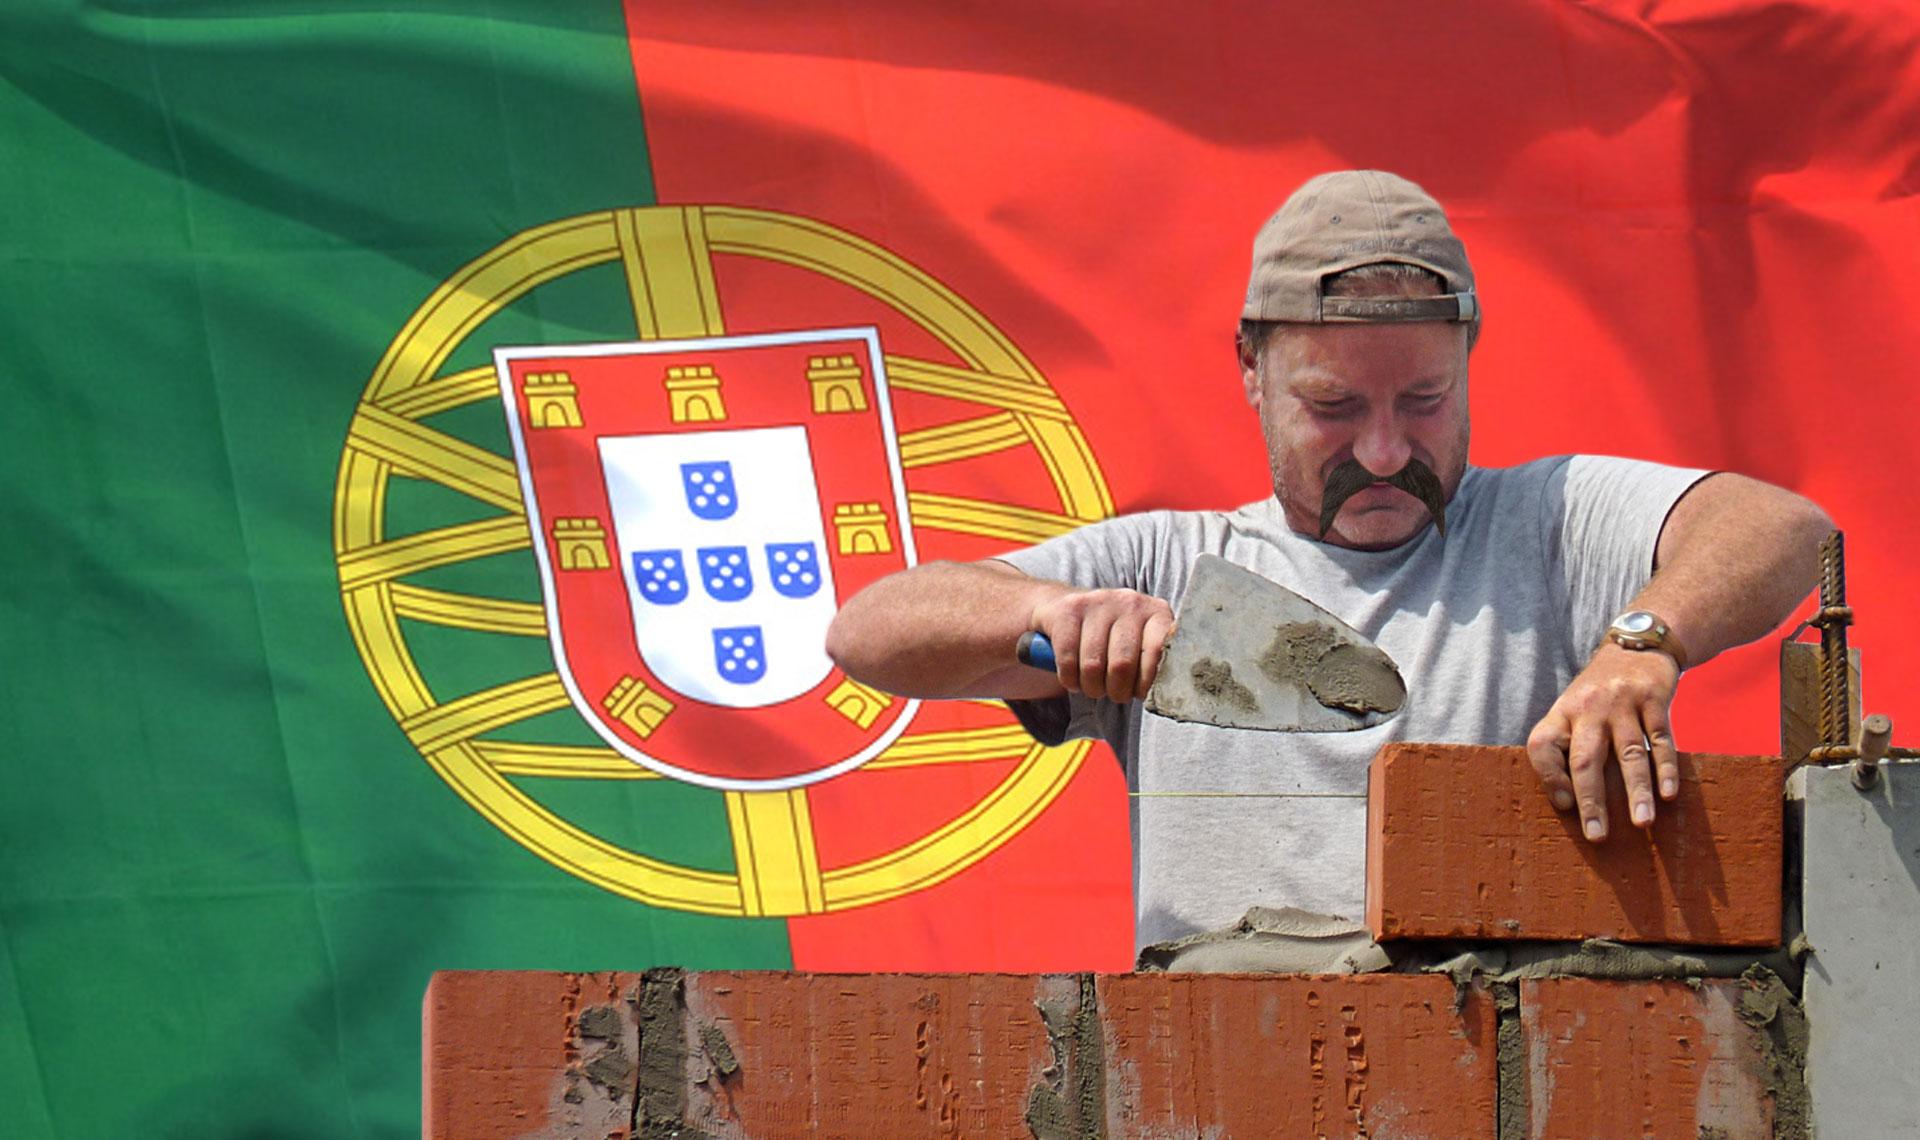 http://media.topito.com/wp-content/uploads/2015/07/une-portugais.jpg